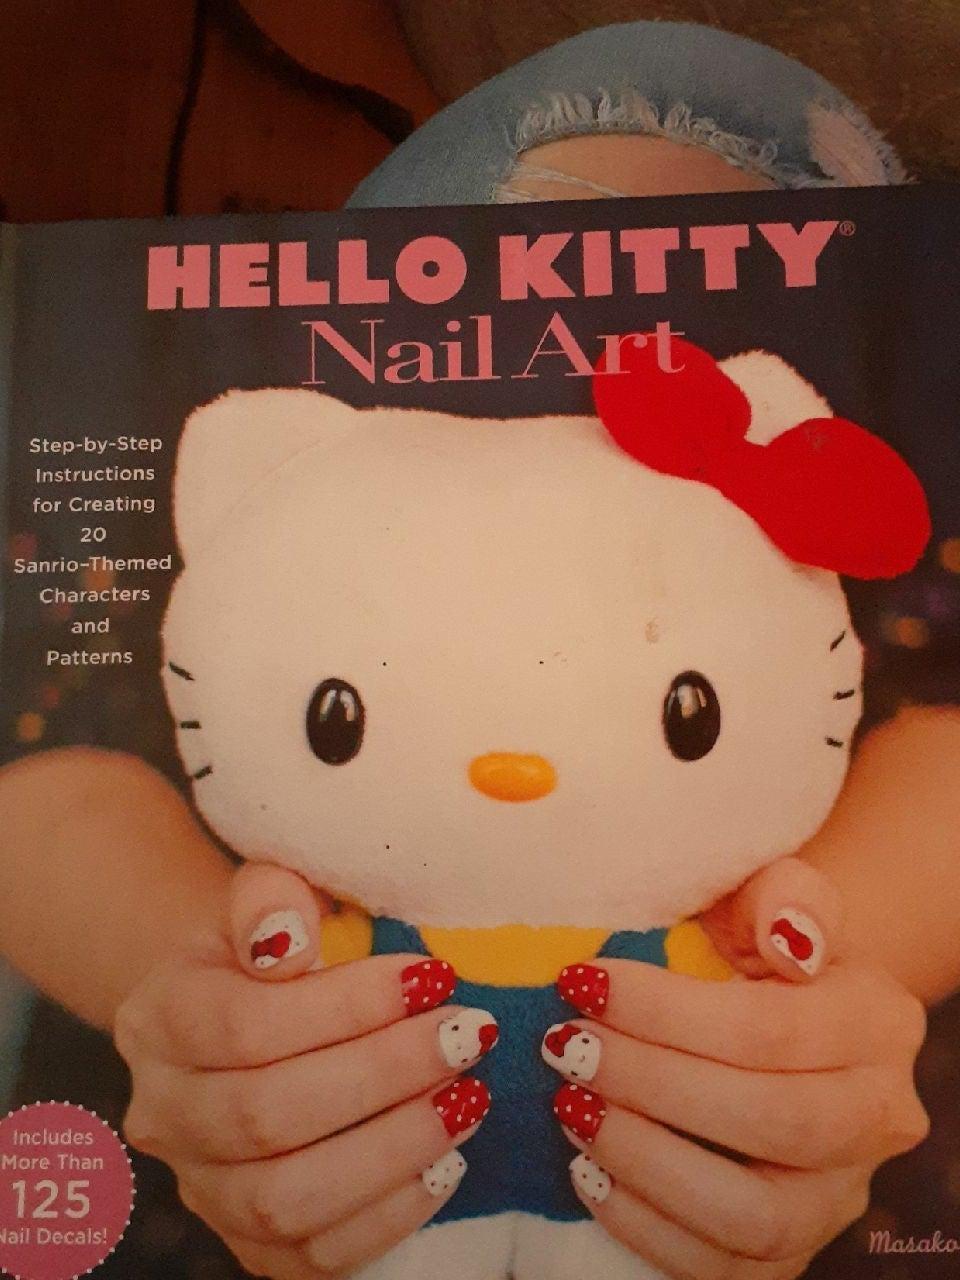 Hello Kitty nail art book